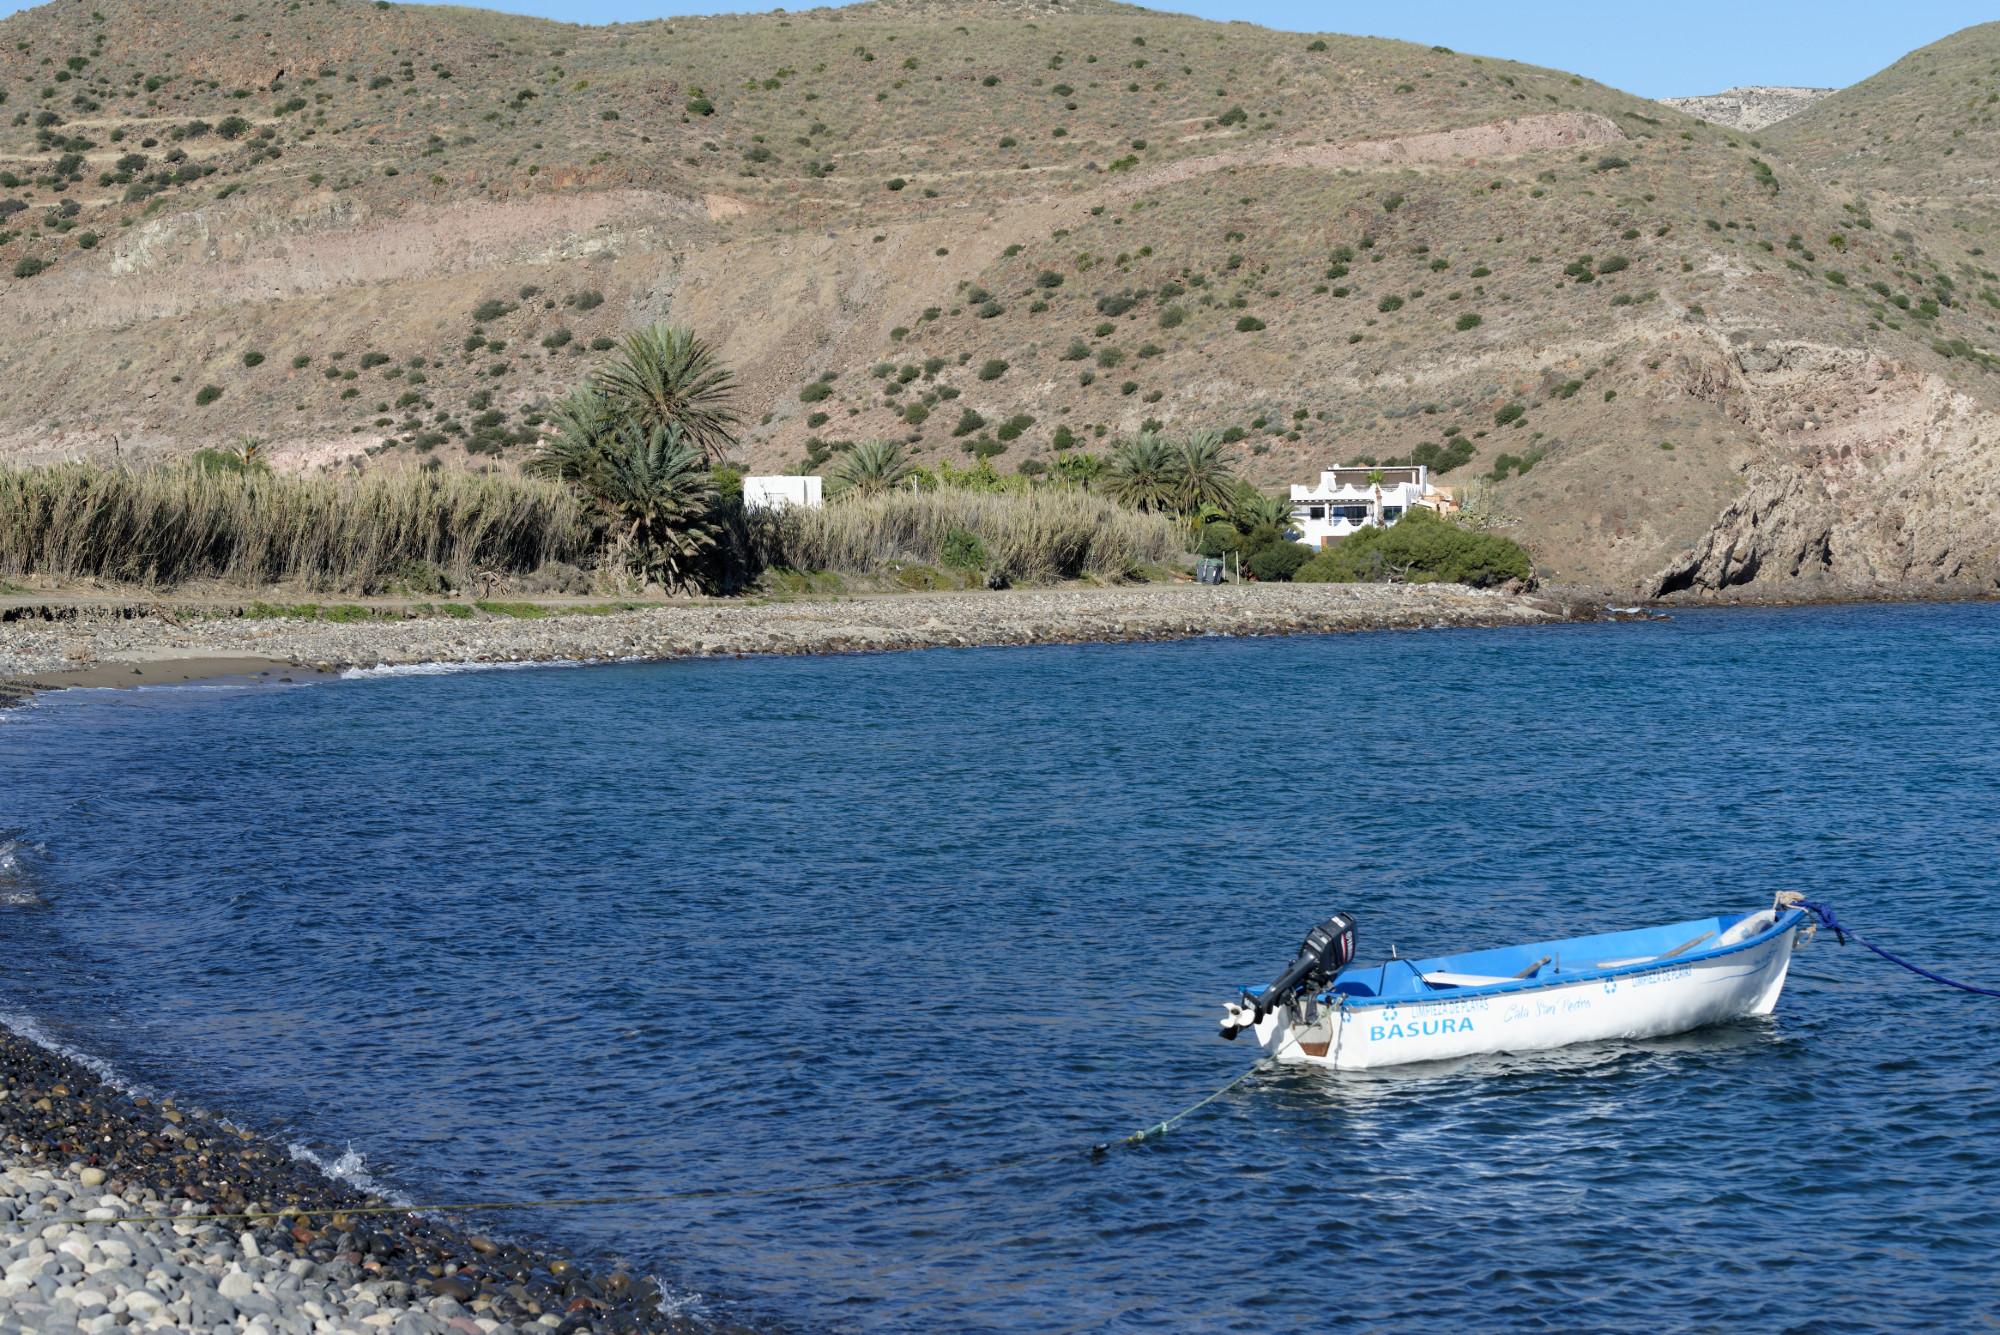 171213-Marche Las Negras-Cala San Pedro-Las Negras (94) (Cabo de Gata-Andalousie)